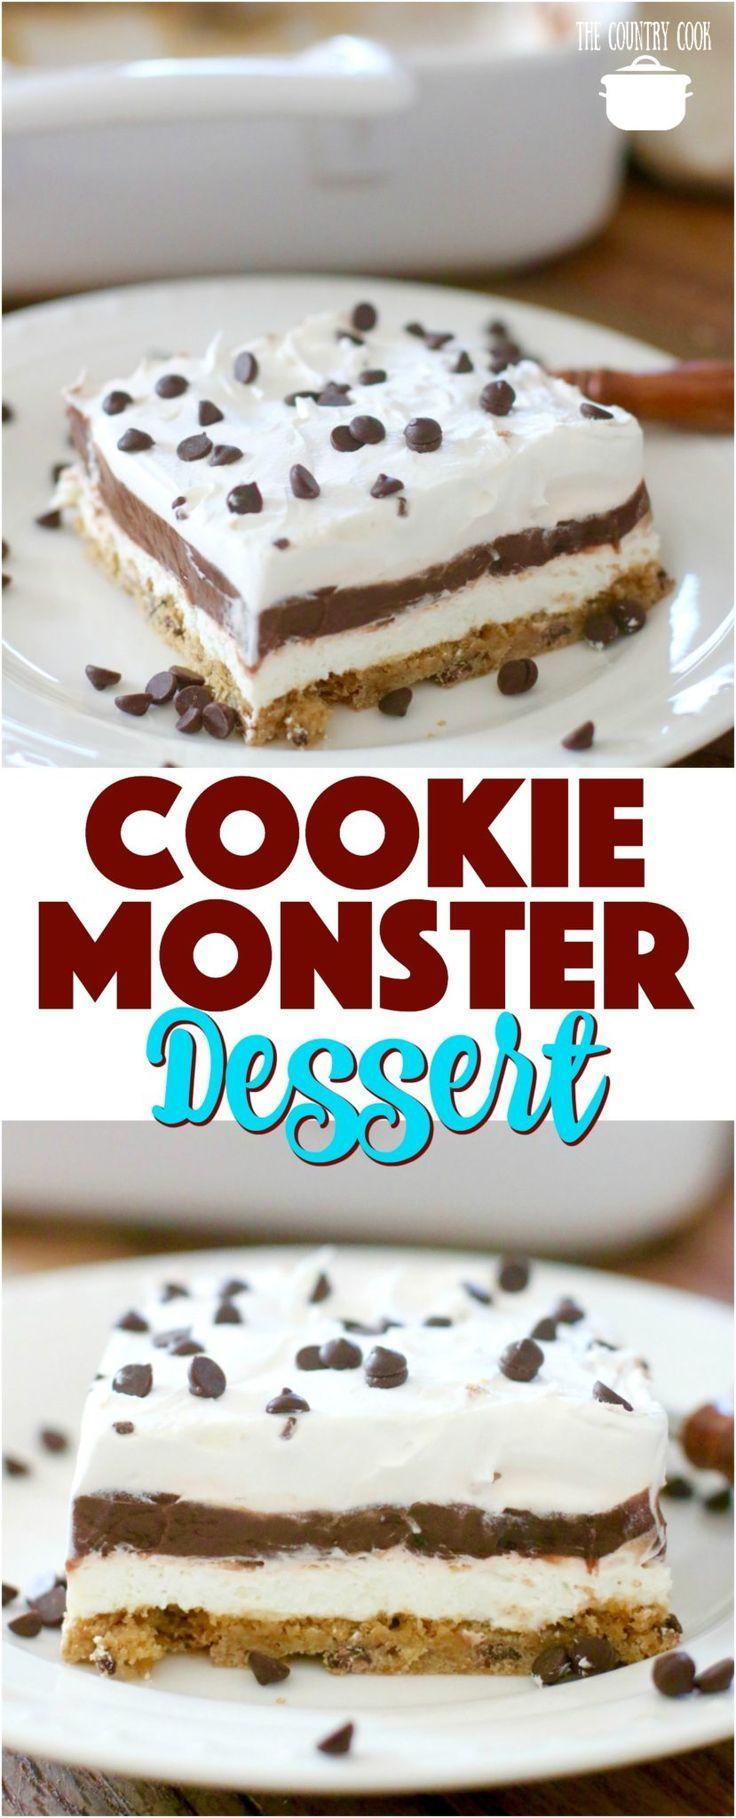 Cookie monster layered dessert